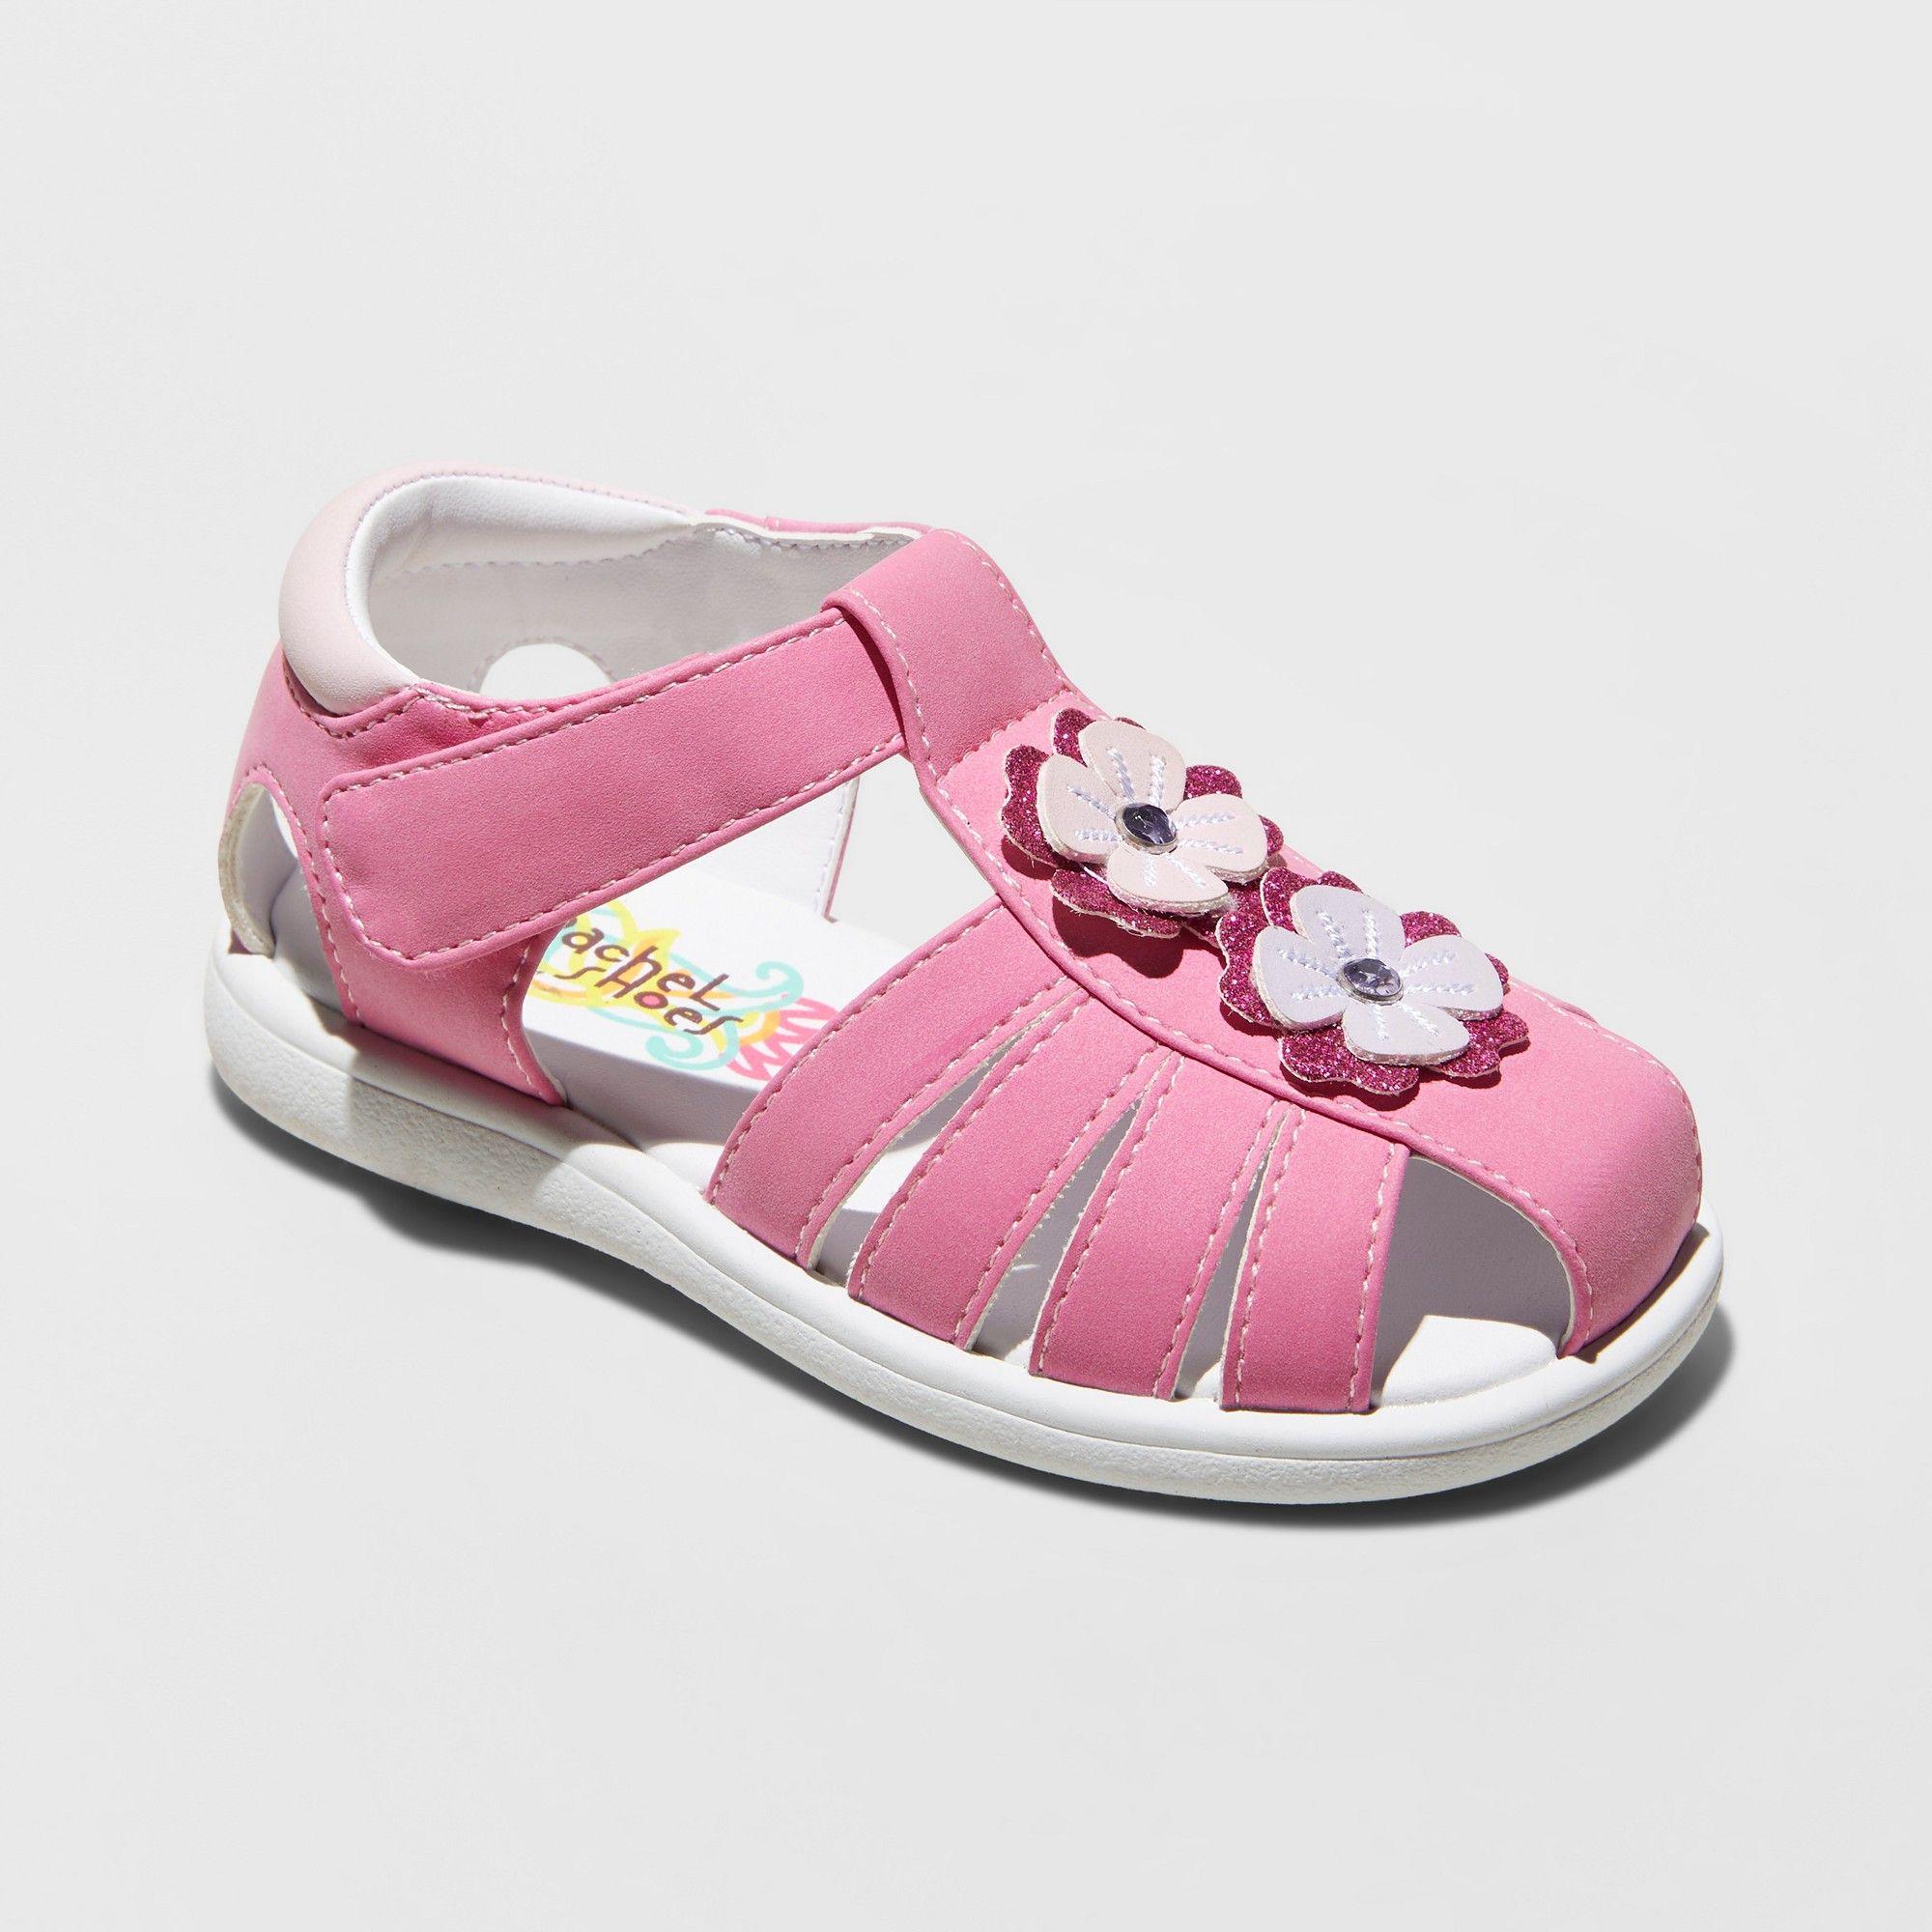 Toddler Girls Rachel Mae Fisherman Sandals Pink 7 Stand Alone